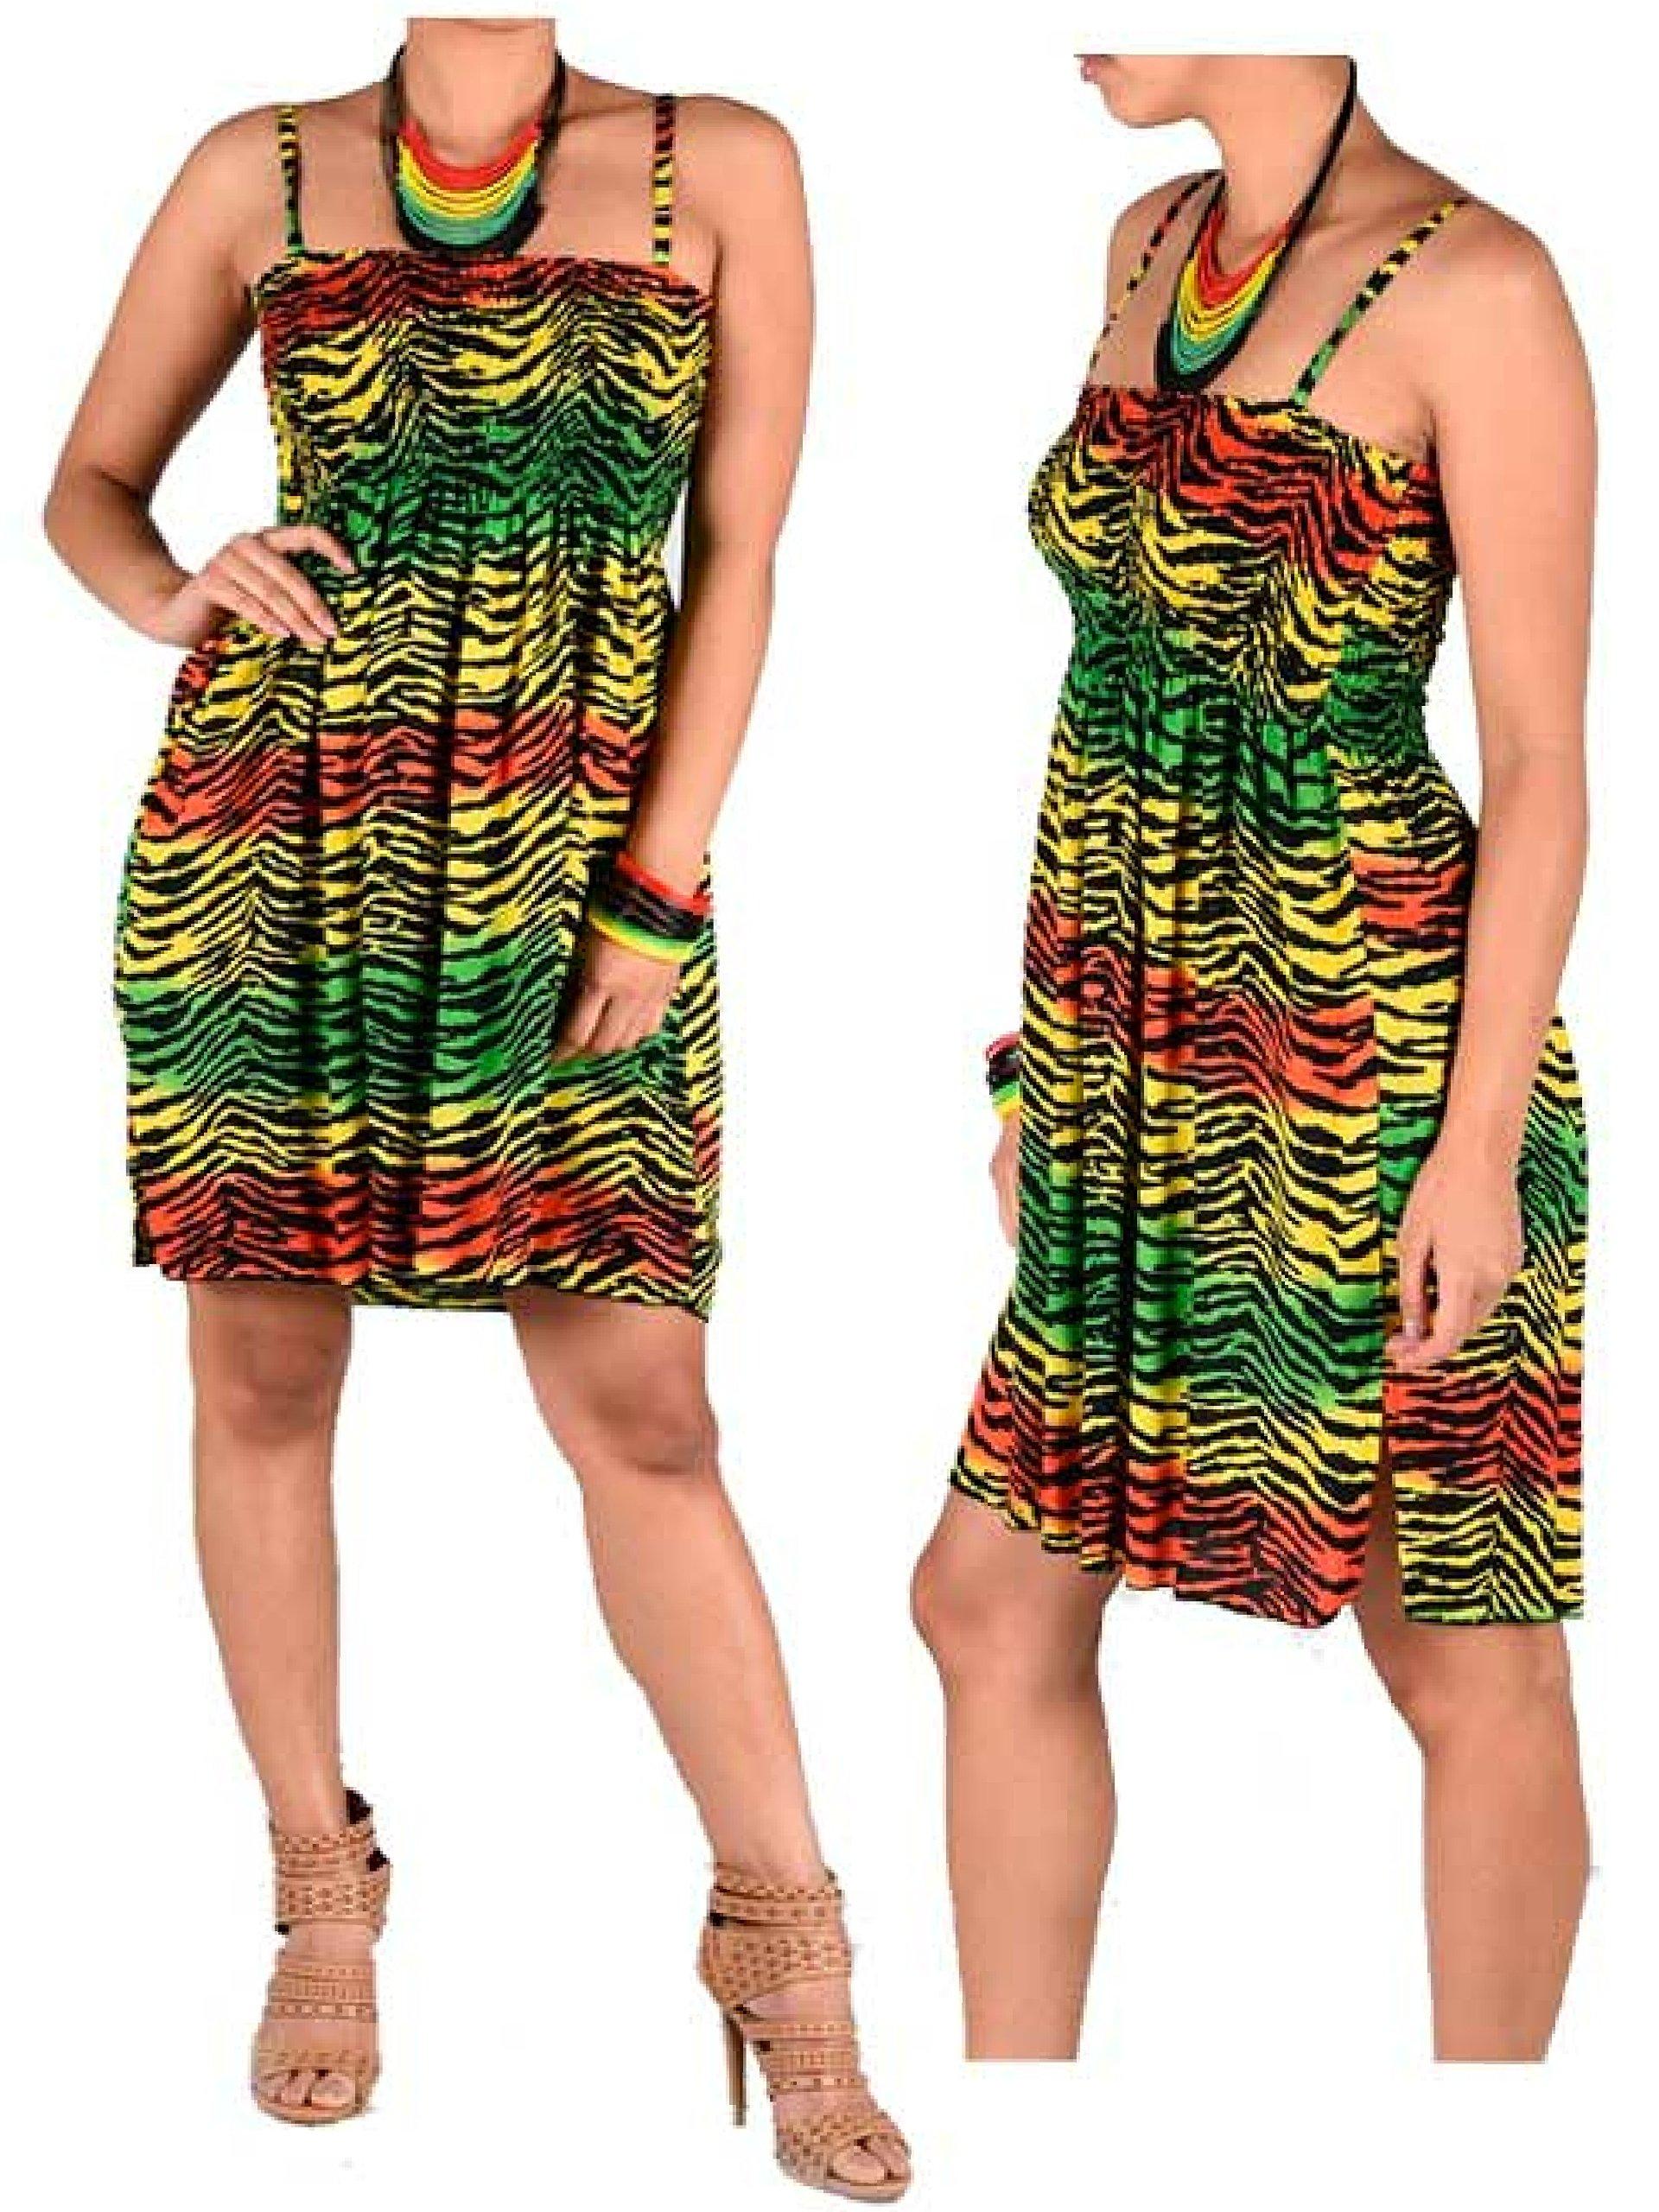 BUNFIREs Women's Festival Rasta Dashiki Zebra Beach Strap Tube Sundress Rasta Bra Bandeau Dress Rasta Wear Dress